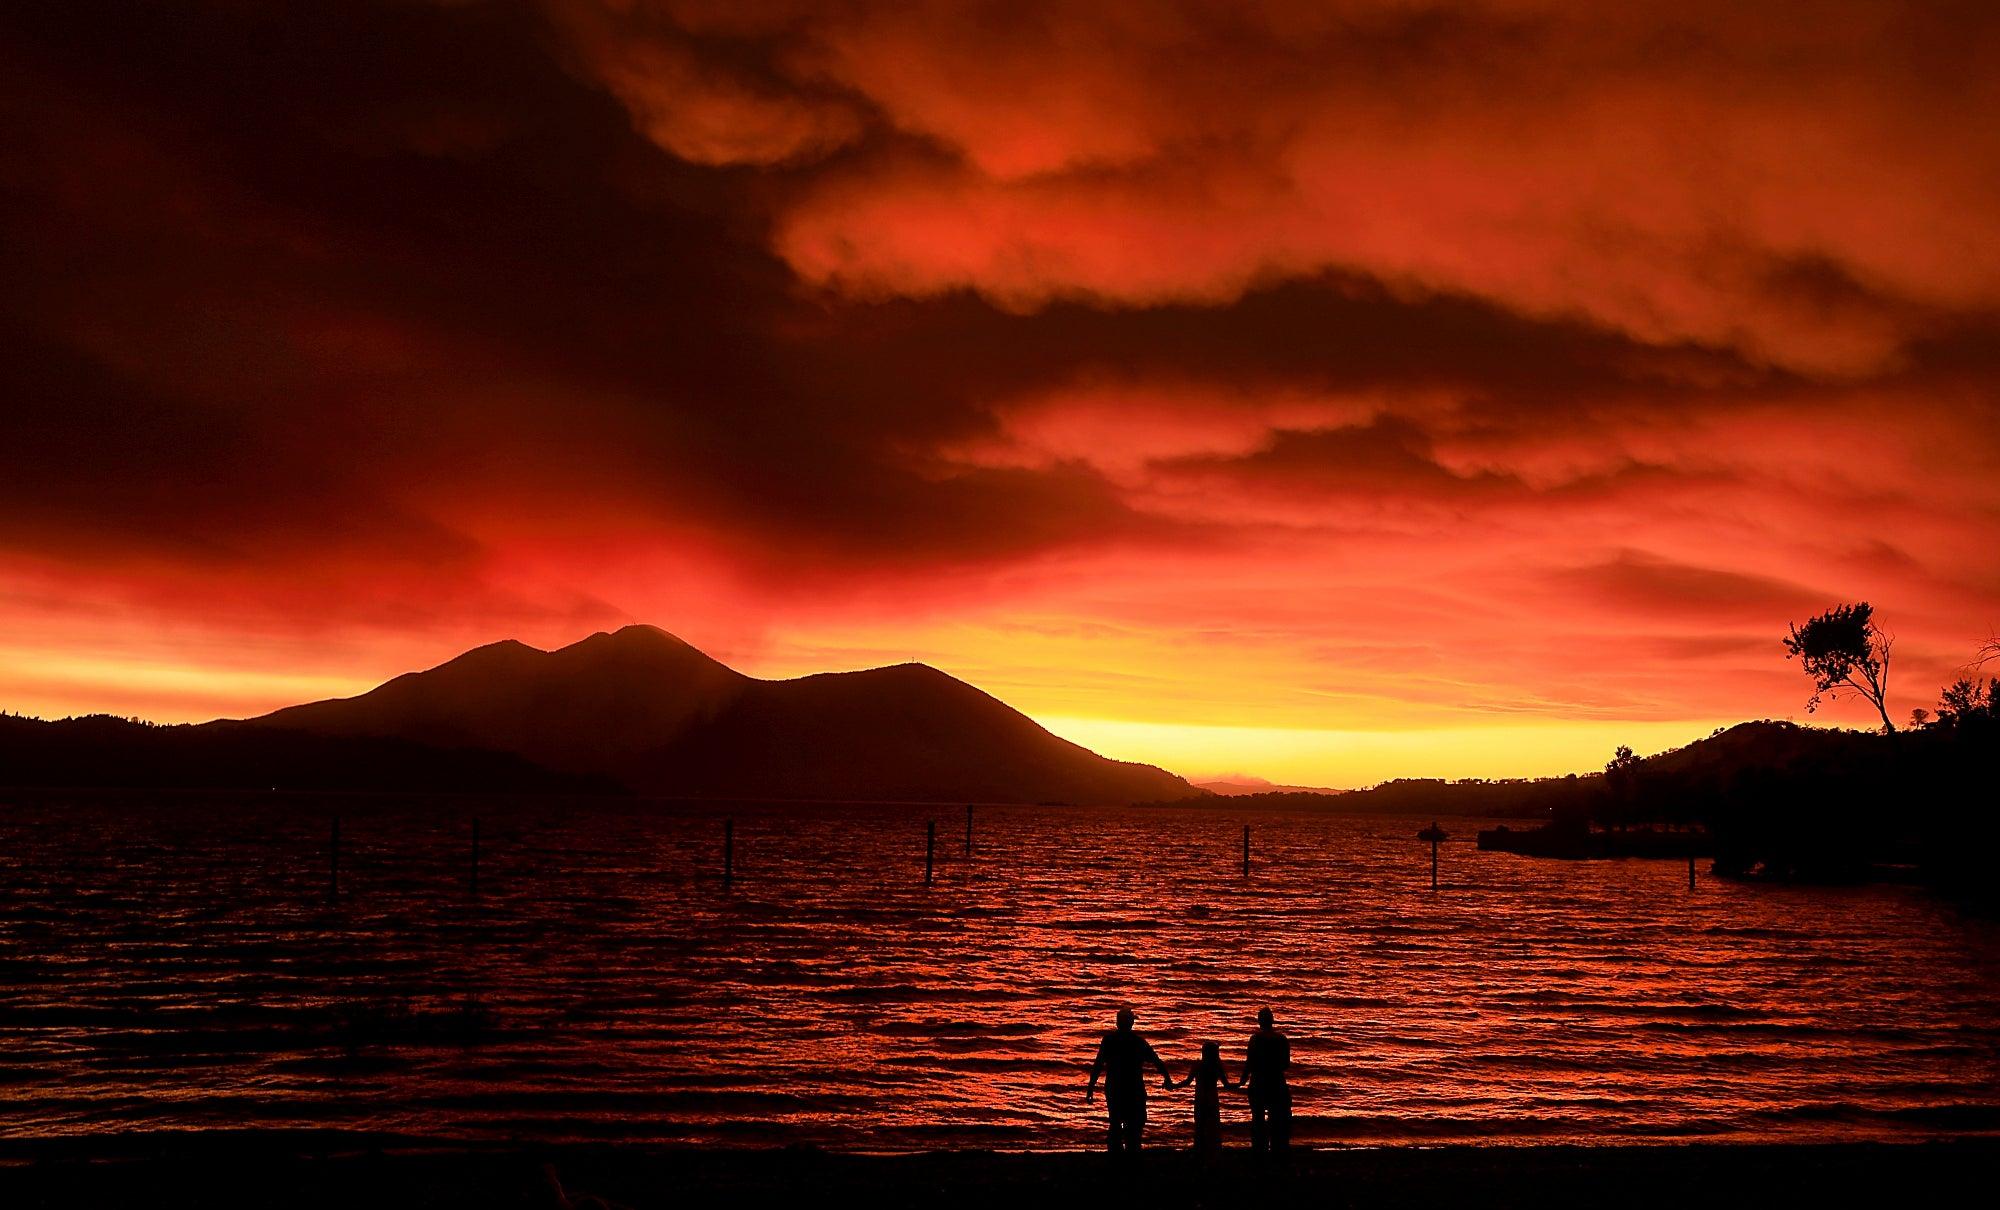 Mendocino fire: Timelapse video shows golden California sunset